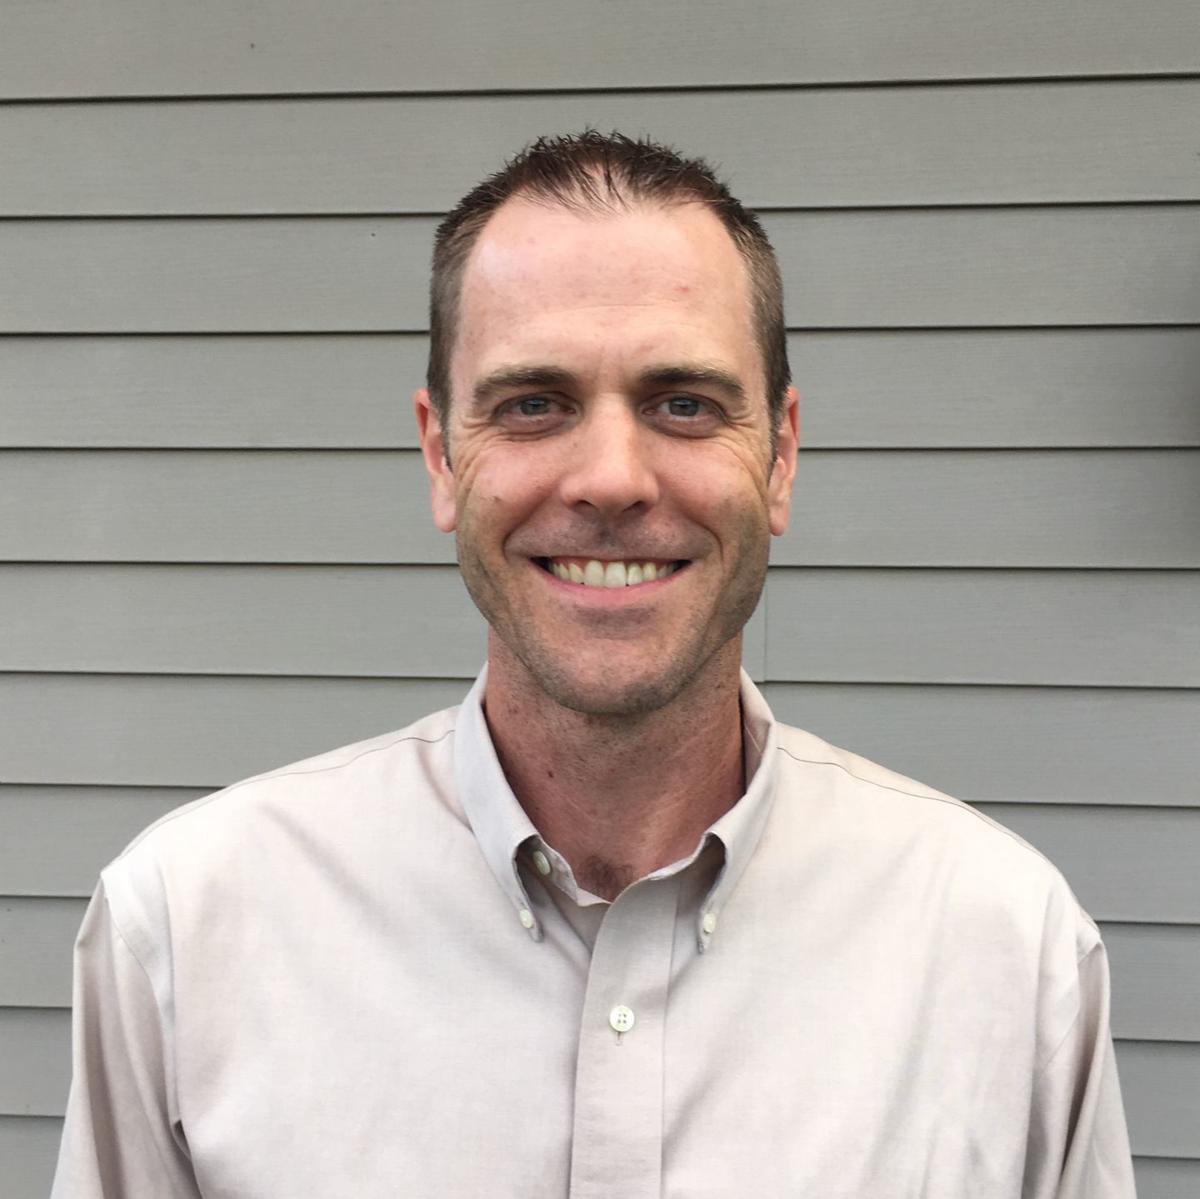 Election: Craig E. Johnson